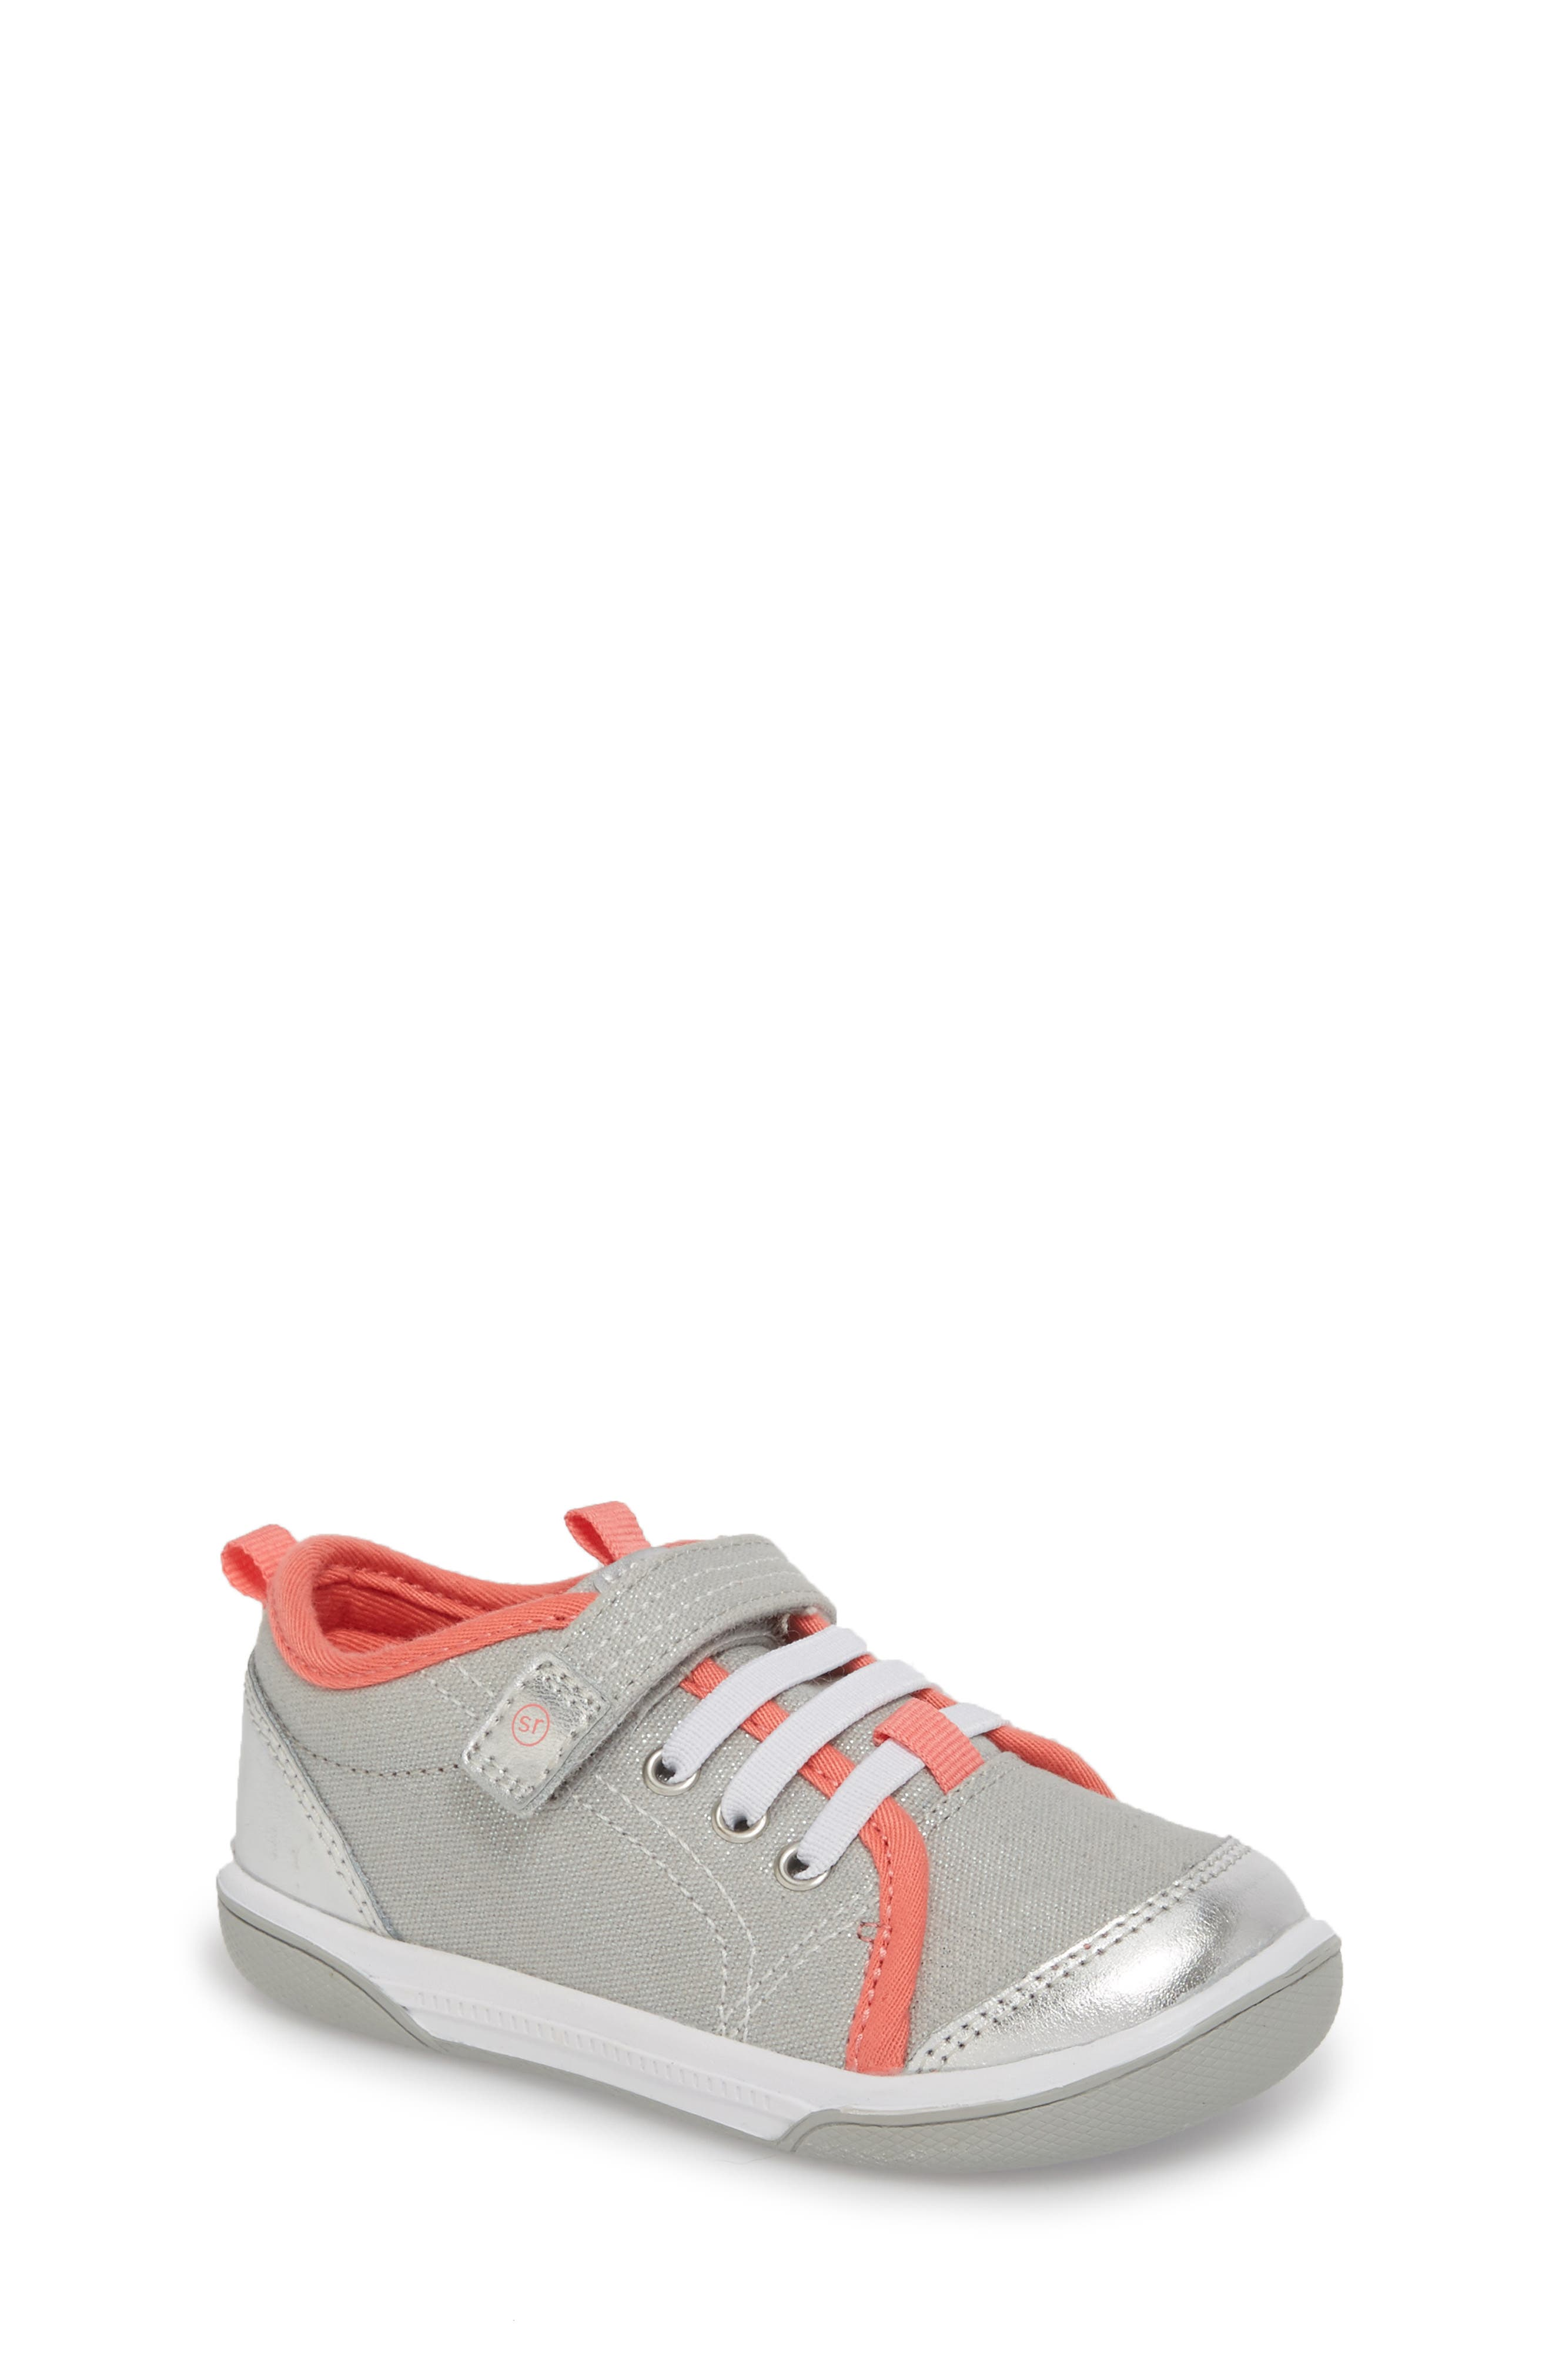 Dakota Sneaker,                             Main thumbnail 1, color,                             LIGHT GREY CANVAS